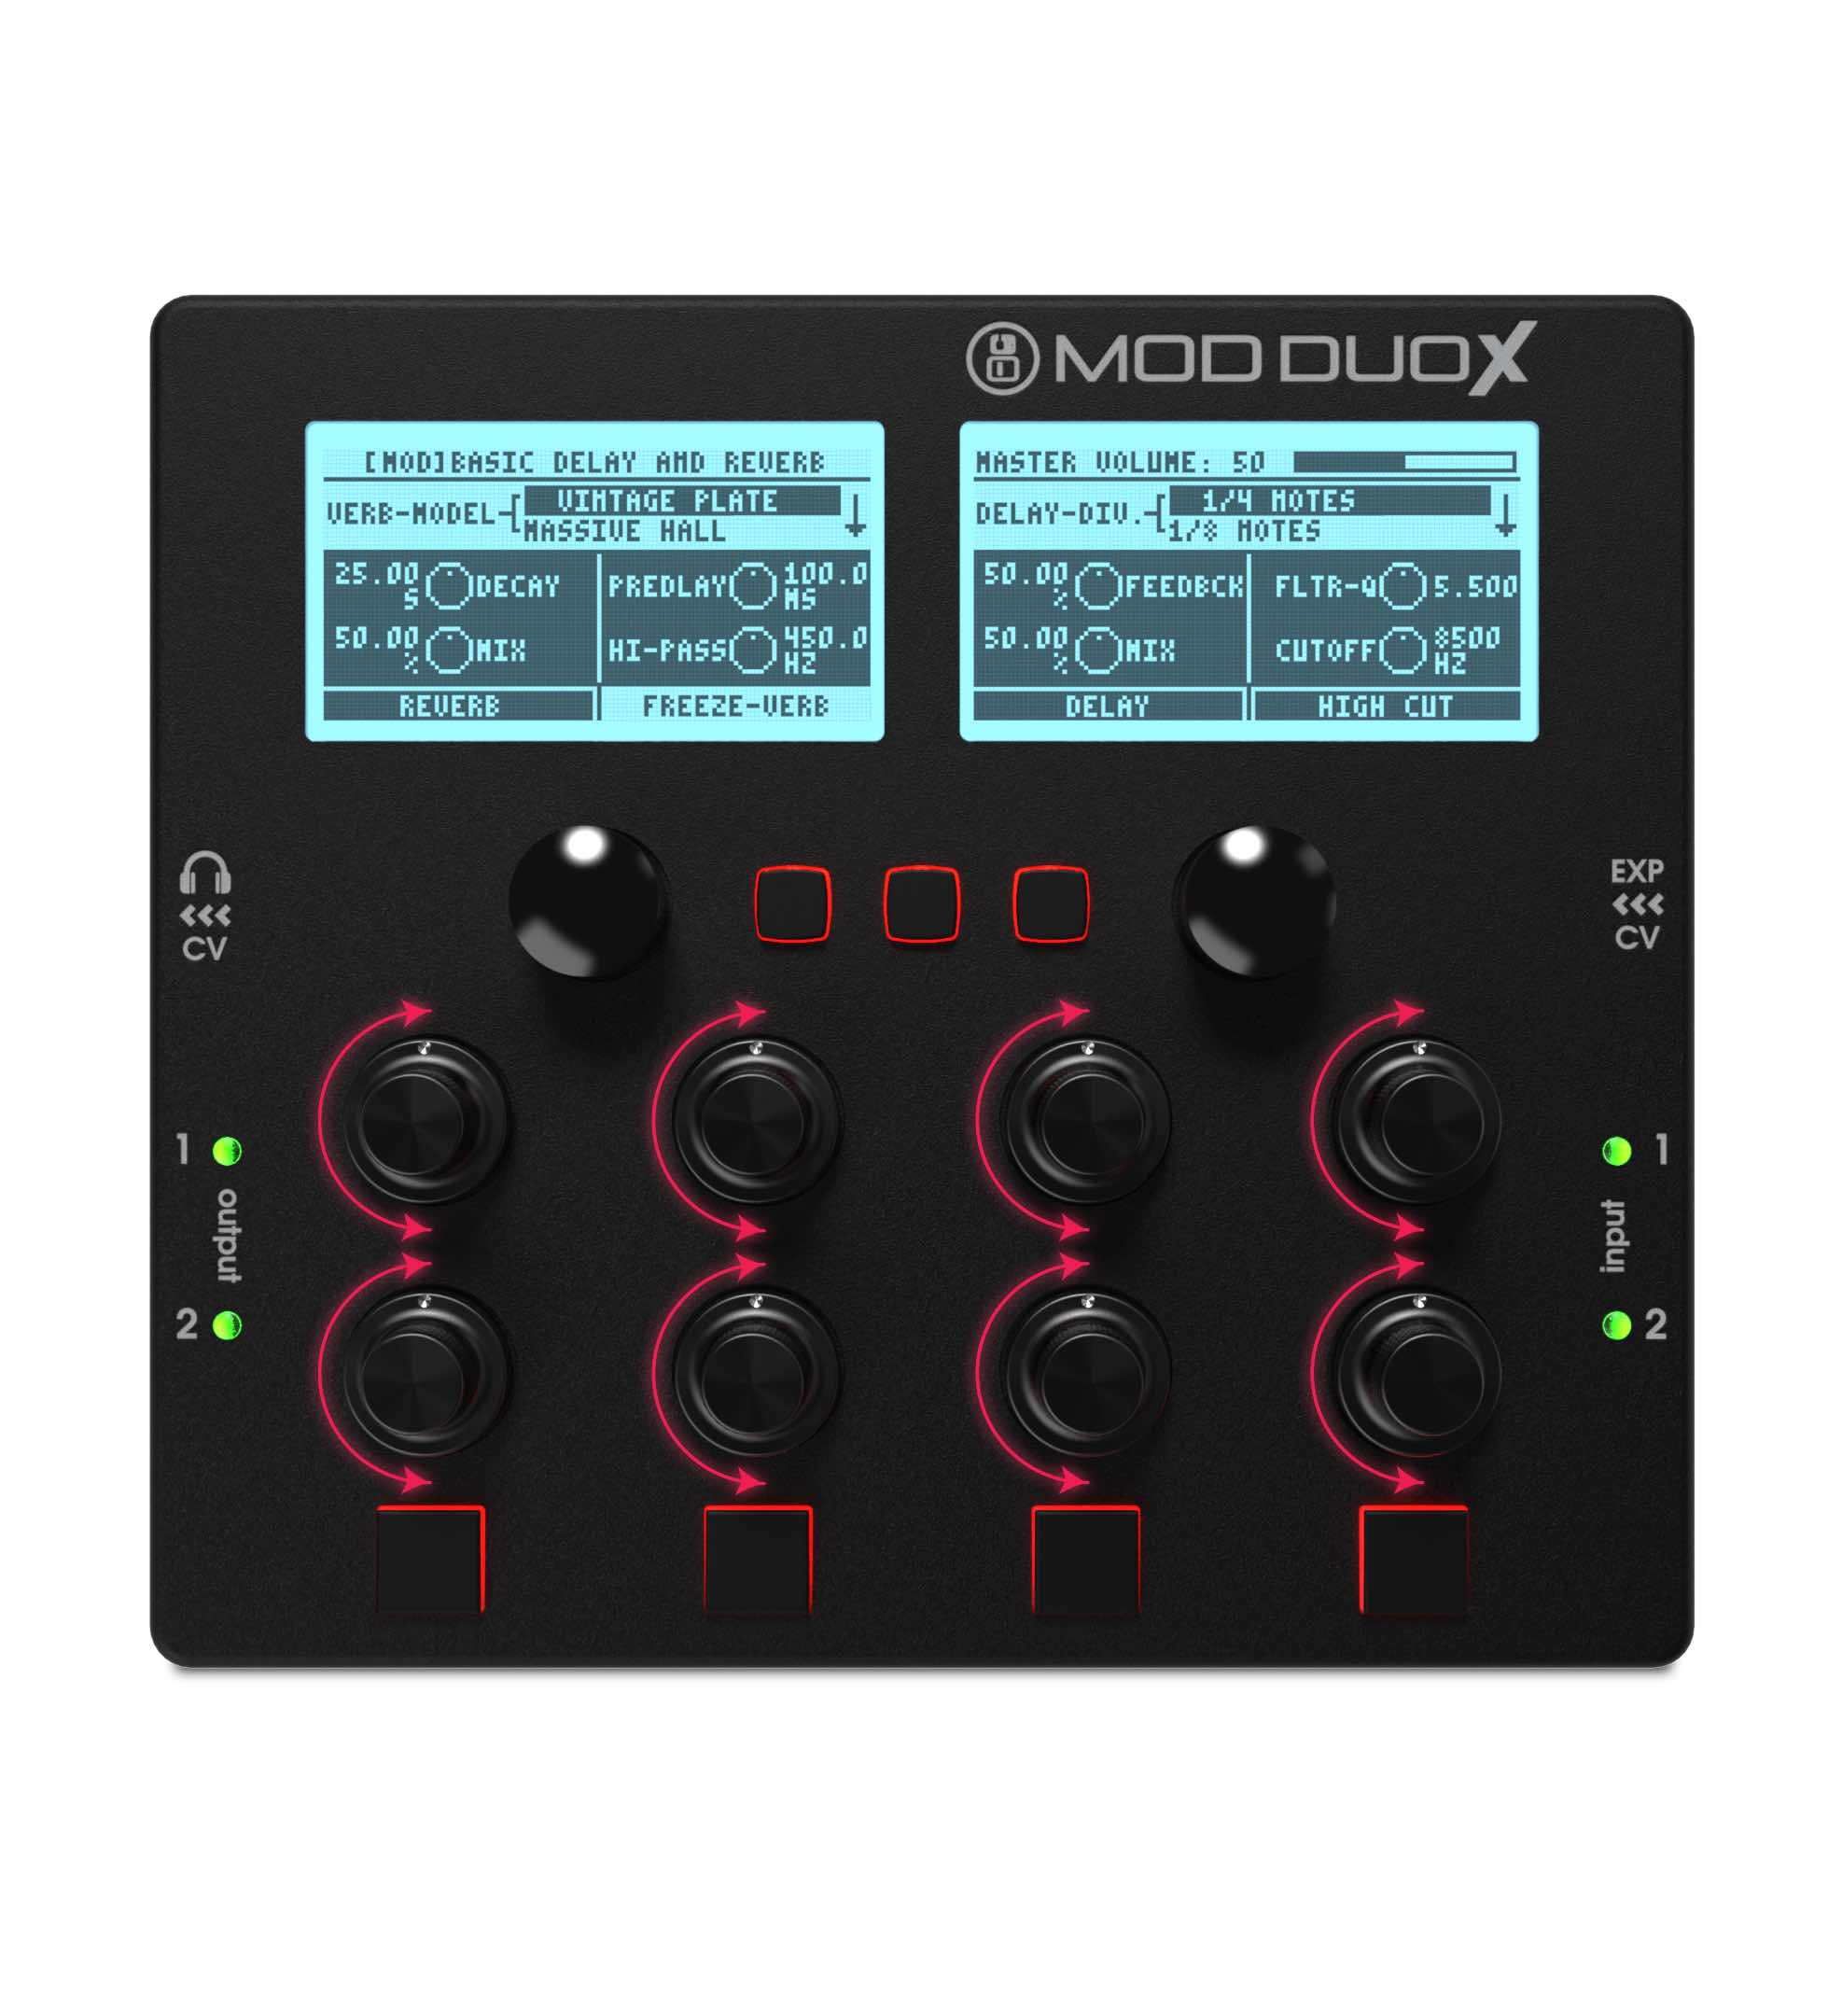 mod devices Mod Duo X controller produzione production music dj djing studio live audiofader